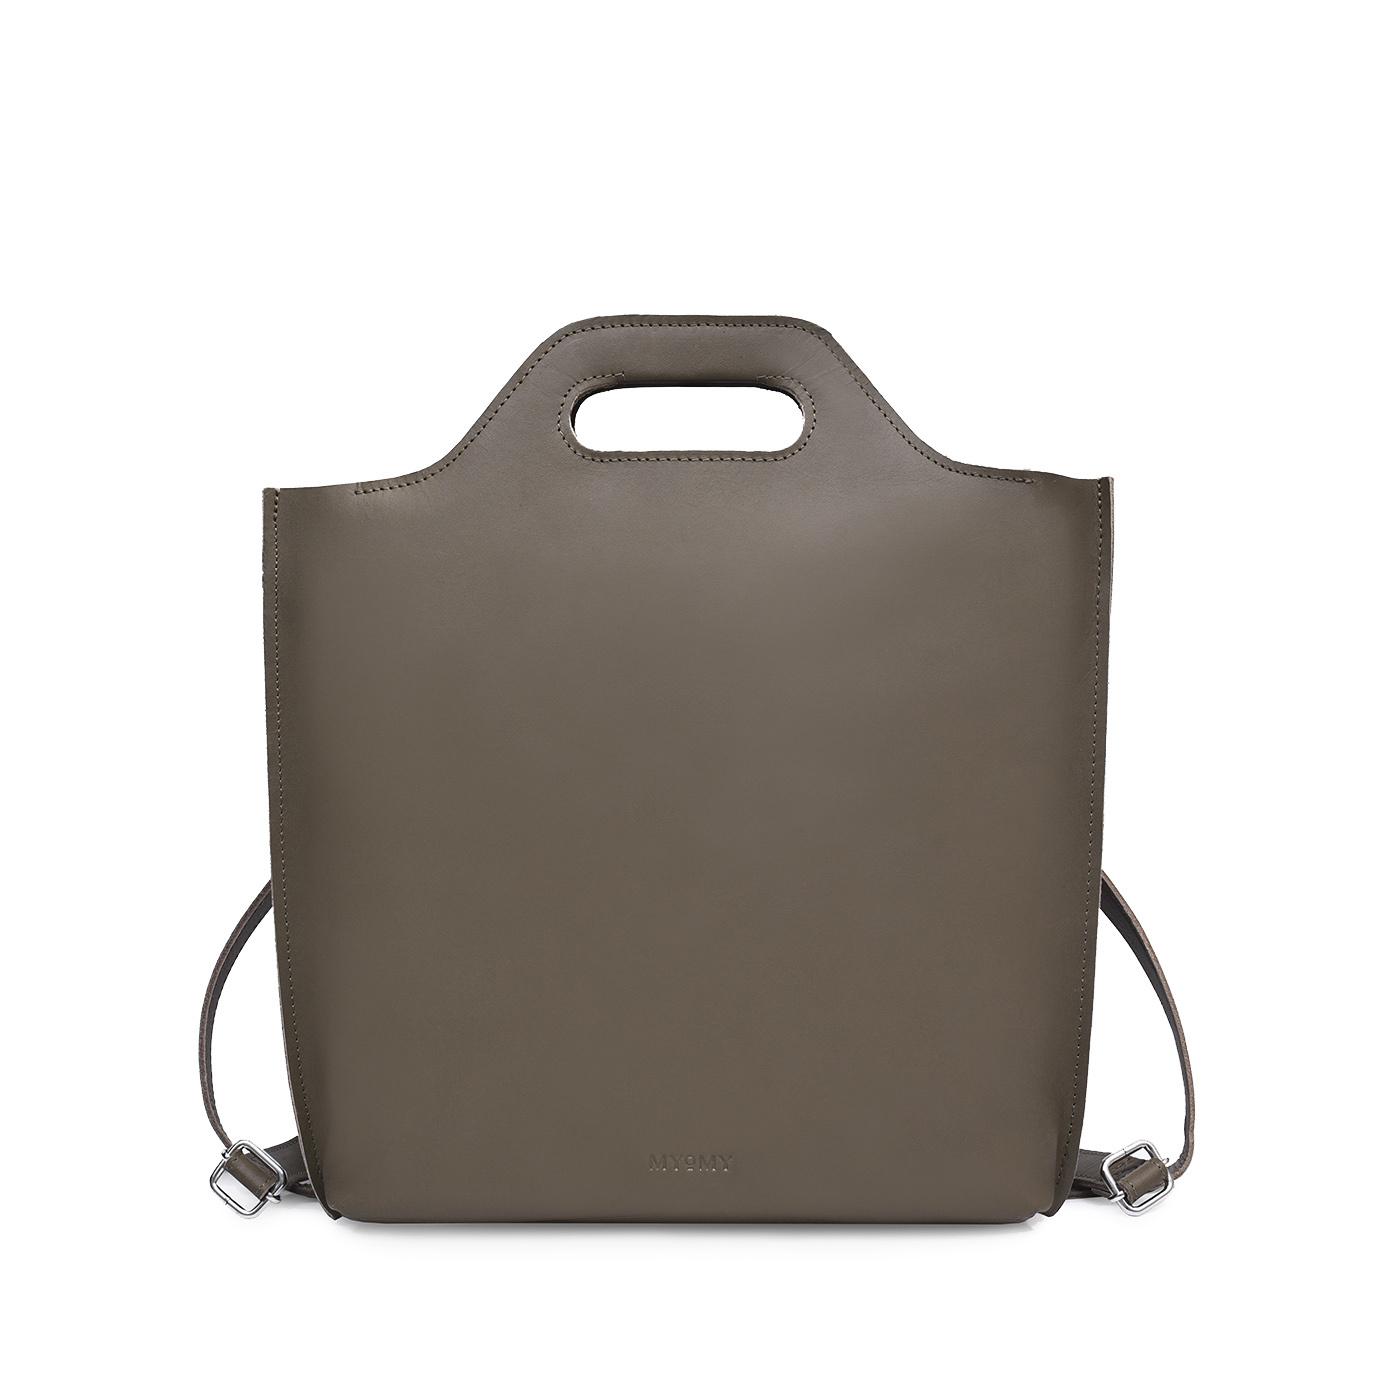 MYoMY MCB Backbag 12 Inch Hunter Taupe